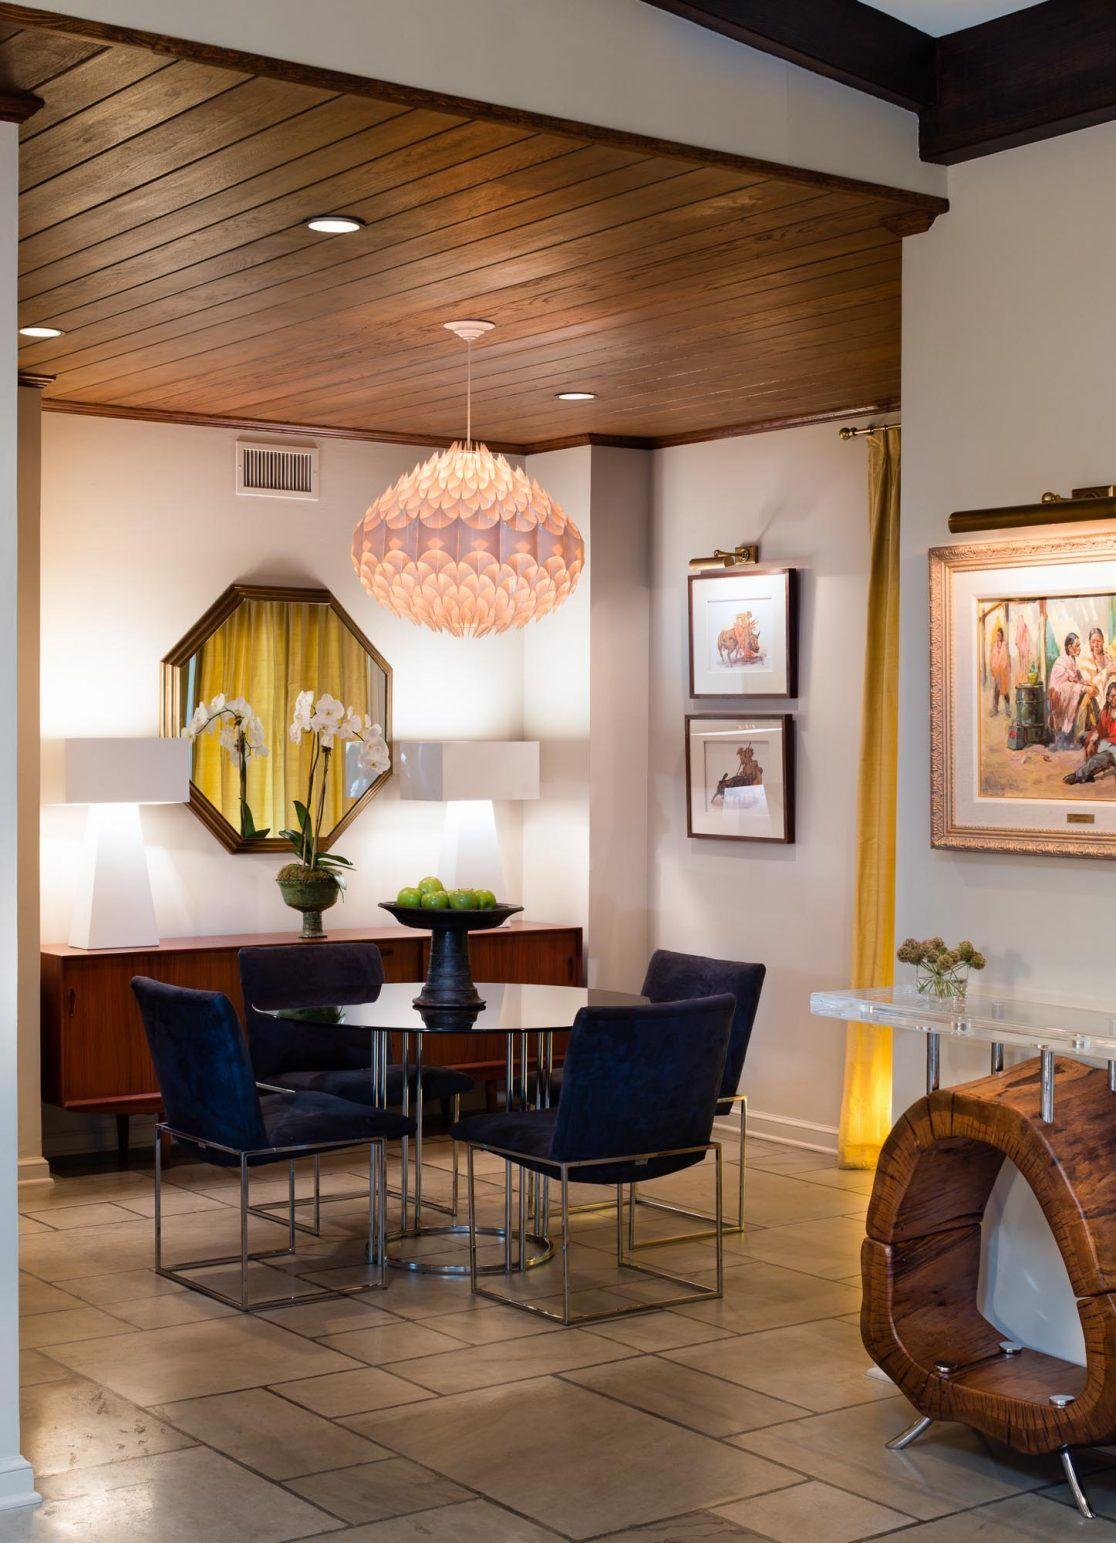 Delightful M Interiors | San Antonio, Texas | Interior Design Firm That Works On  Luxury Residences